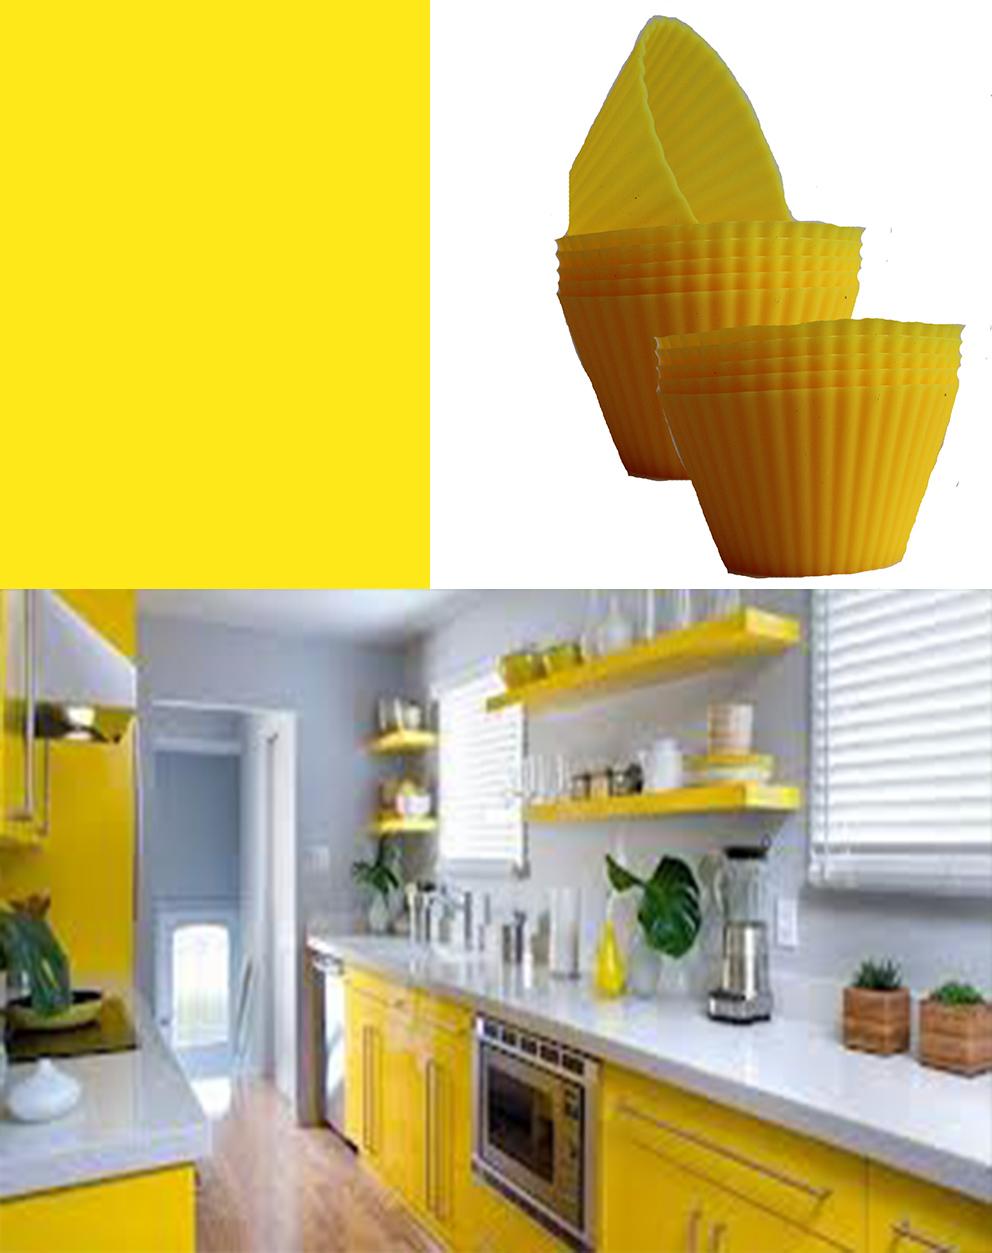 BG-POW-cupcake-cups-Yellow-Kitchen.jpg